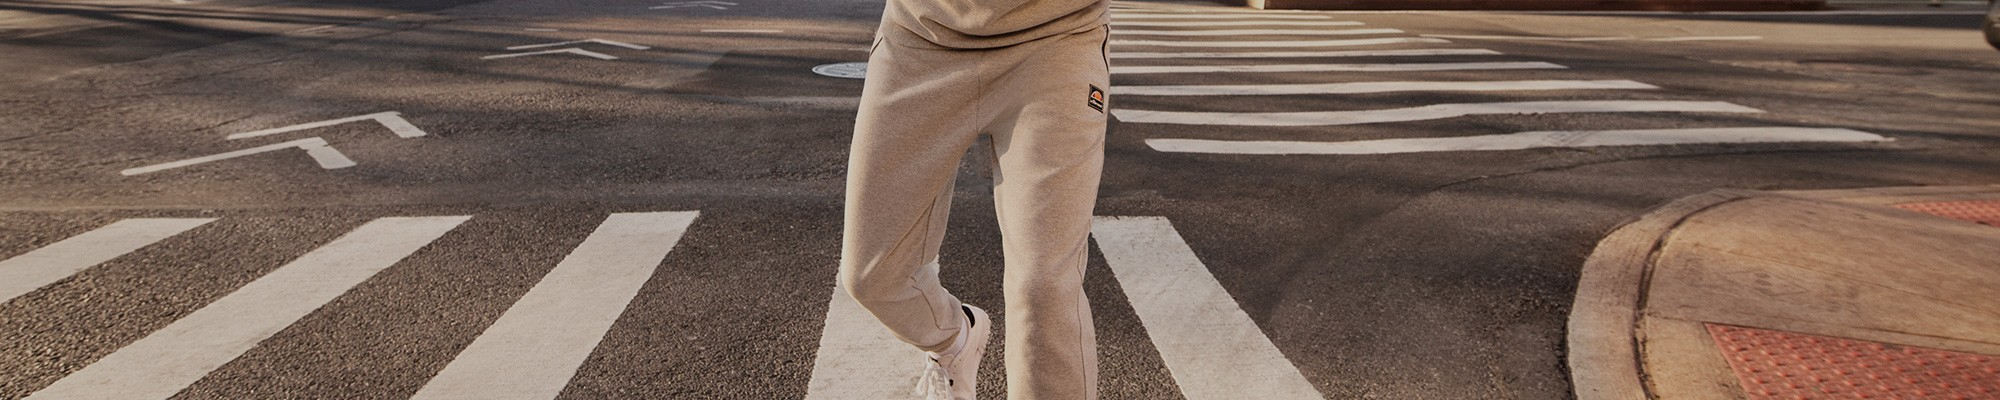 Pantalon deportivos hombre - Pantalones Chandal Ellesse